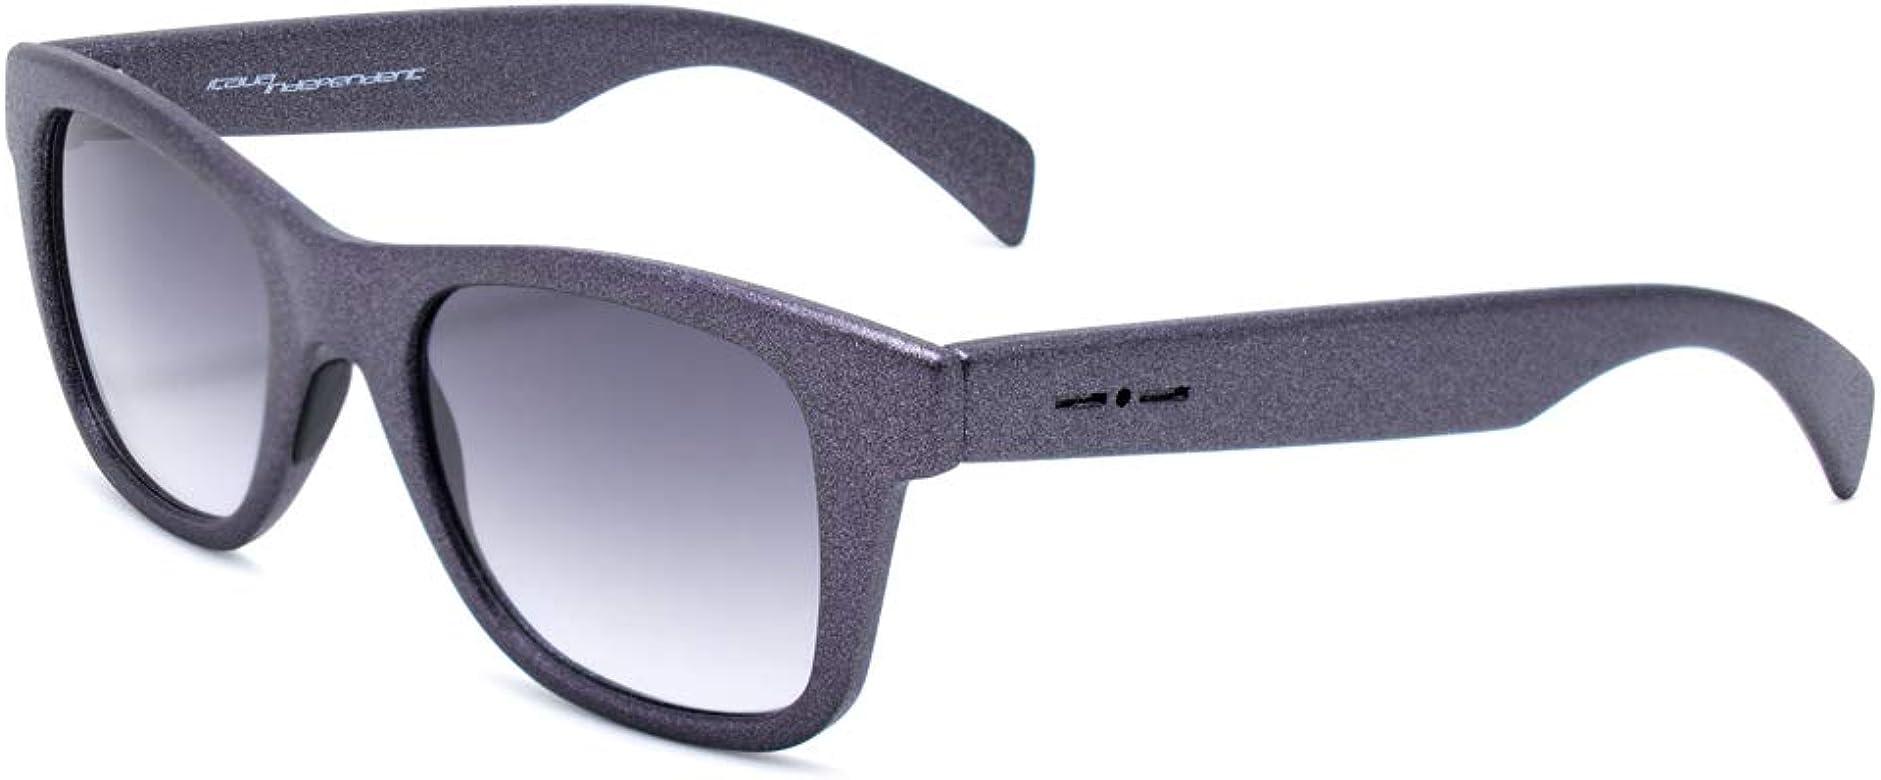 italia independent 0090BTT-017-000 Gafas de Sol, Gris, 46 ...